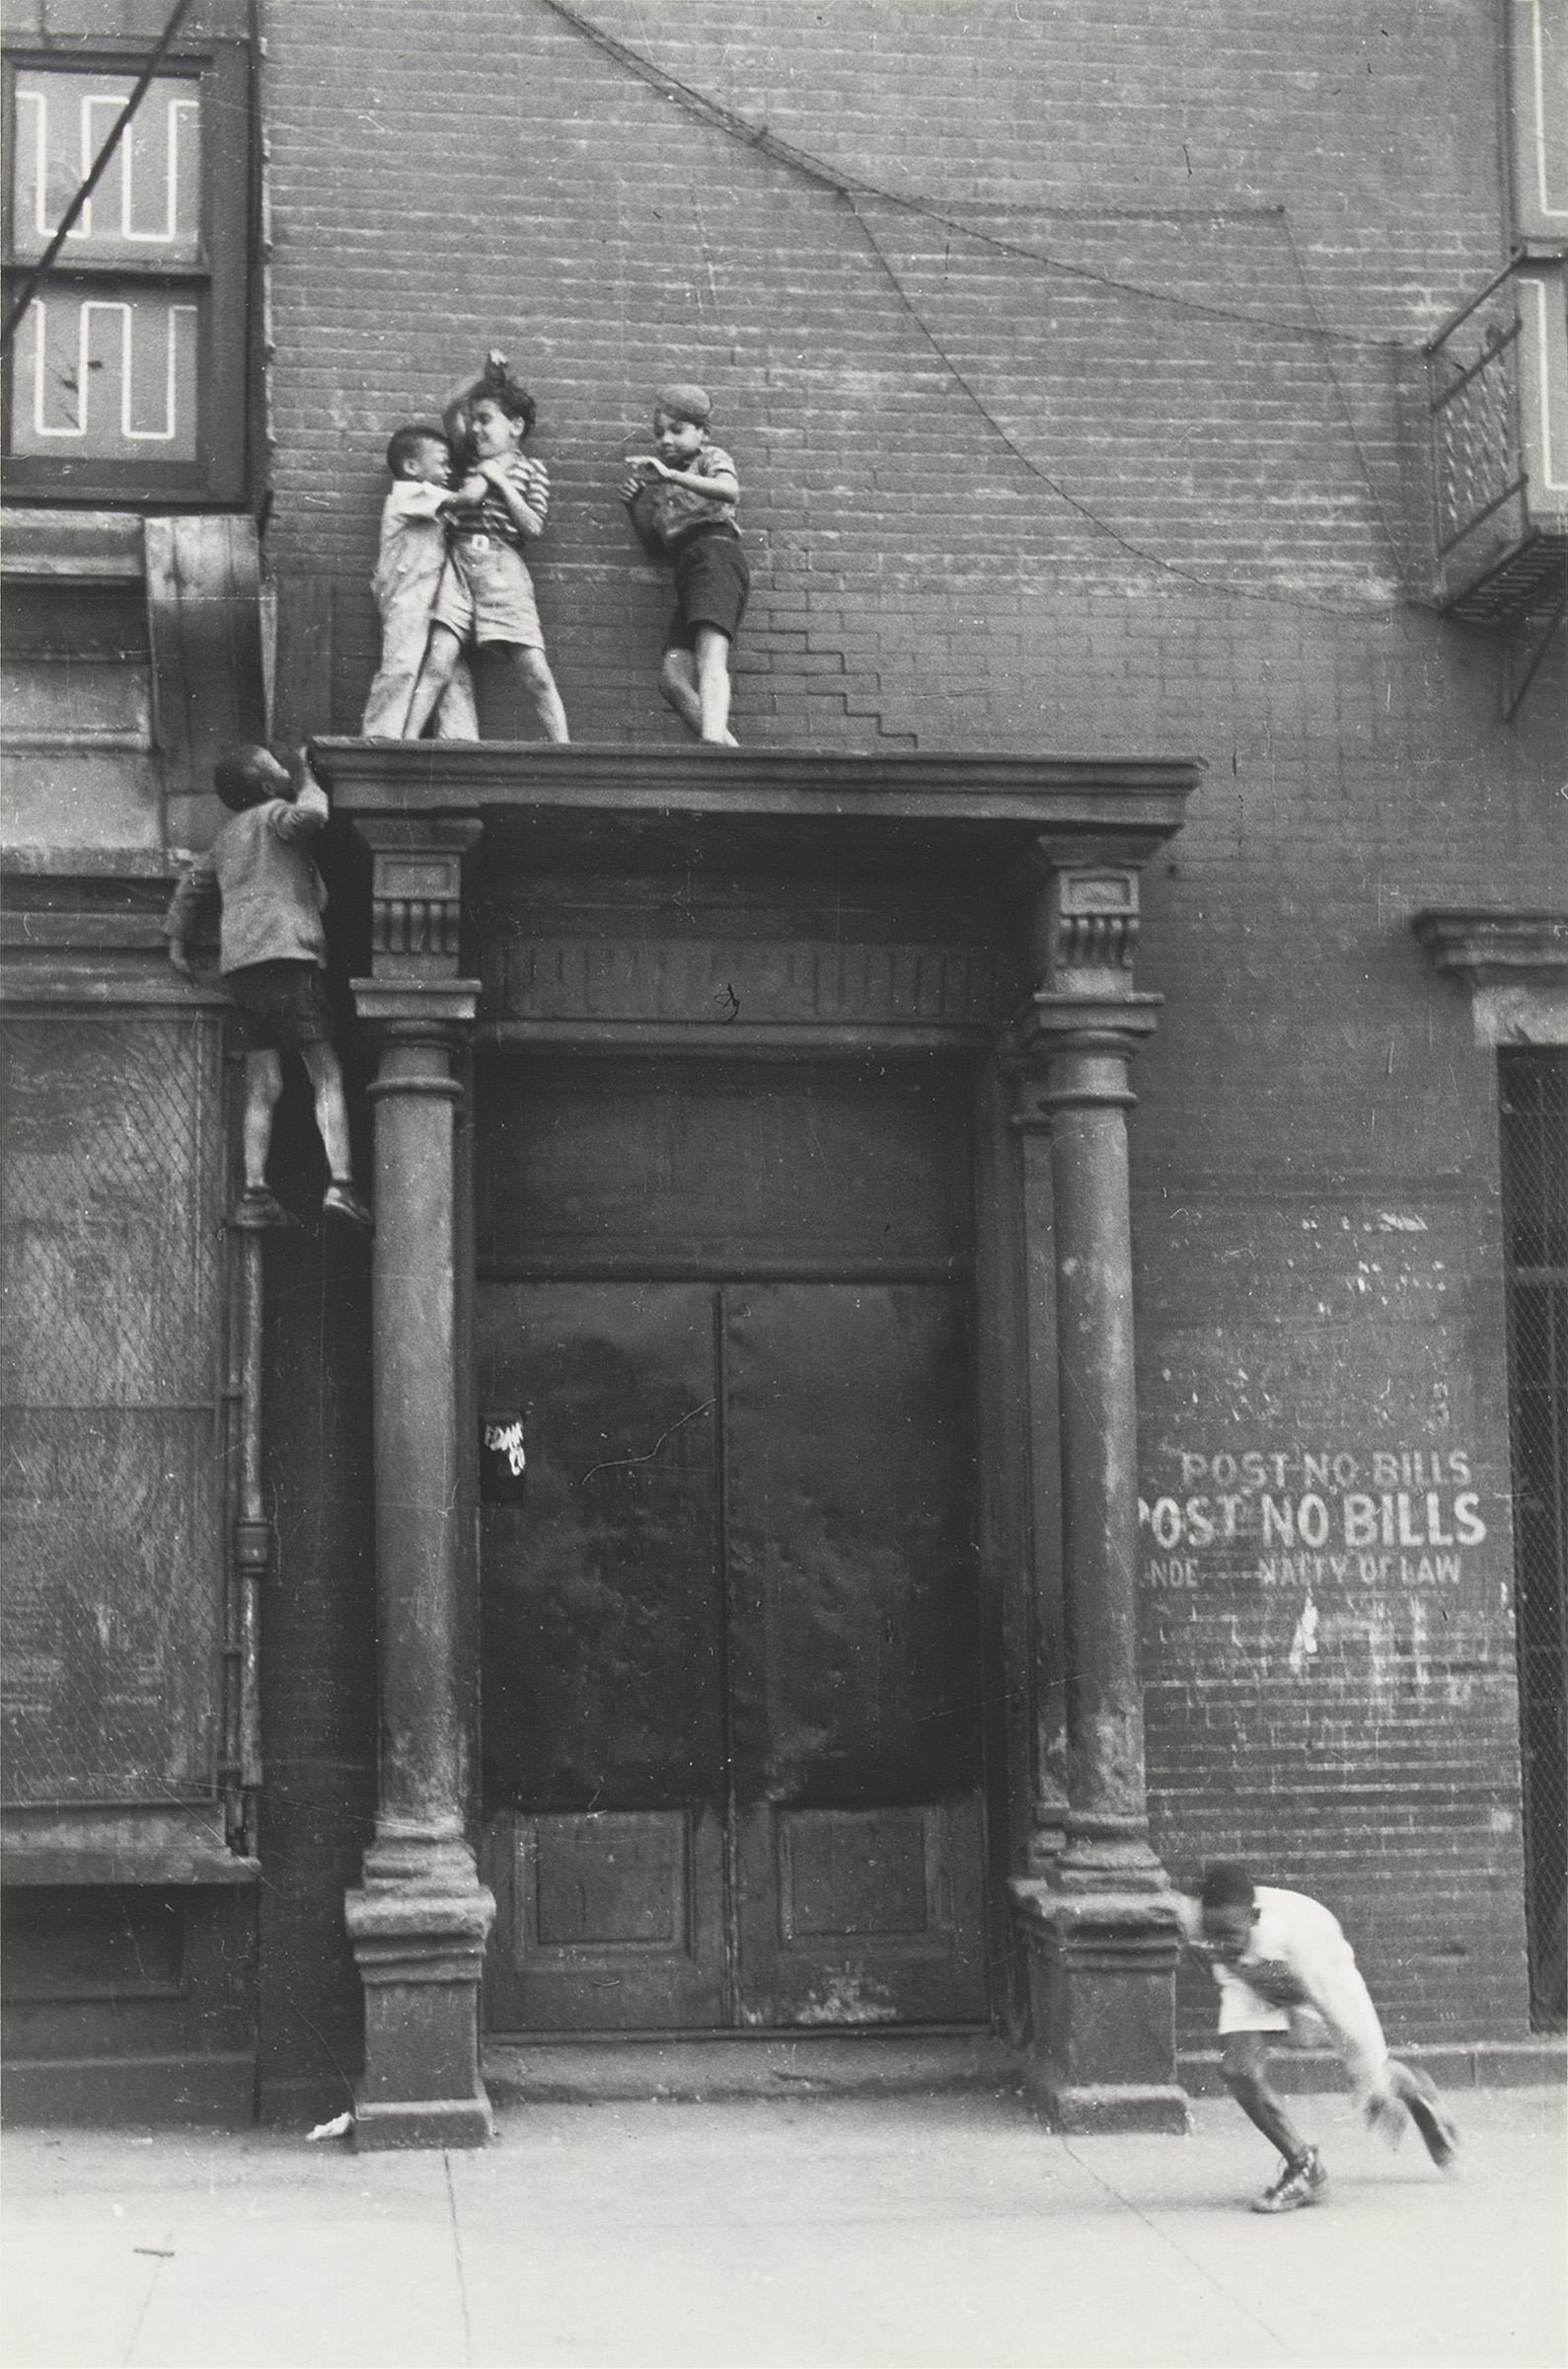 New York, c. 1940